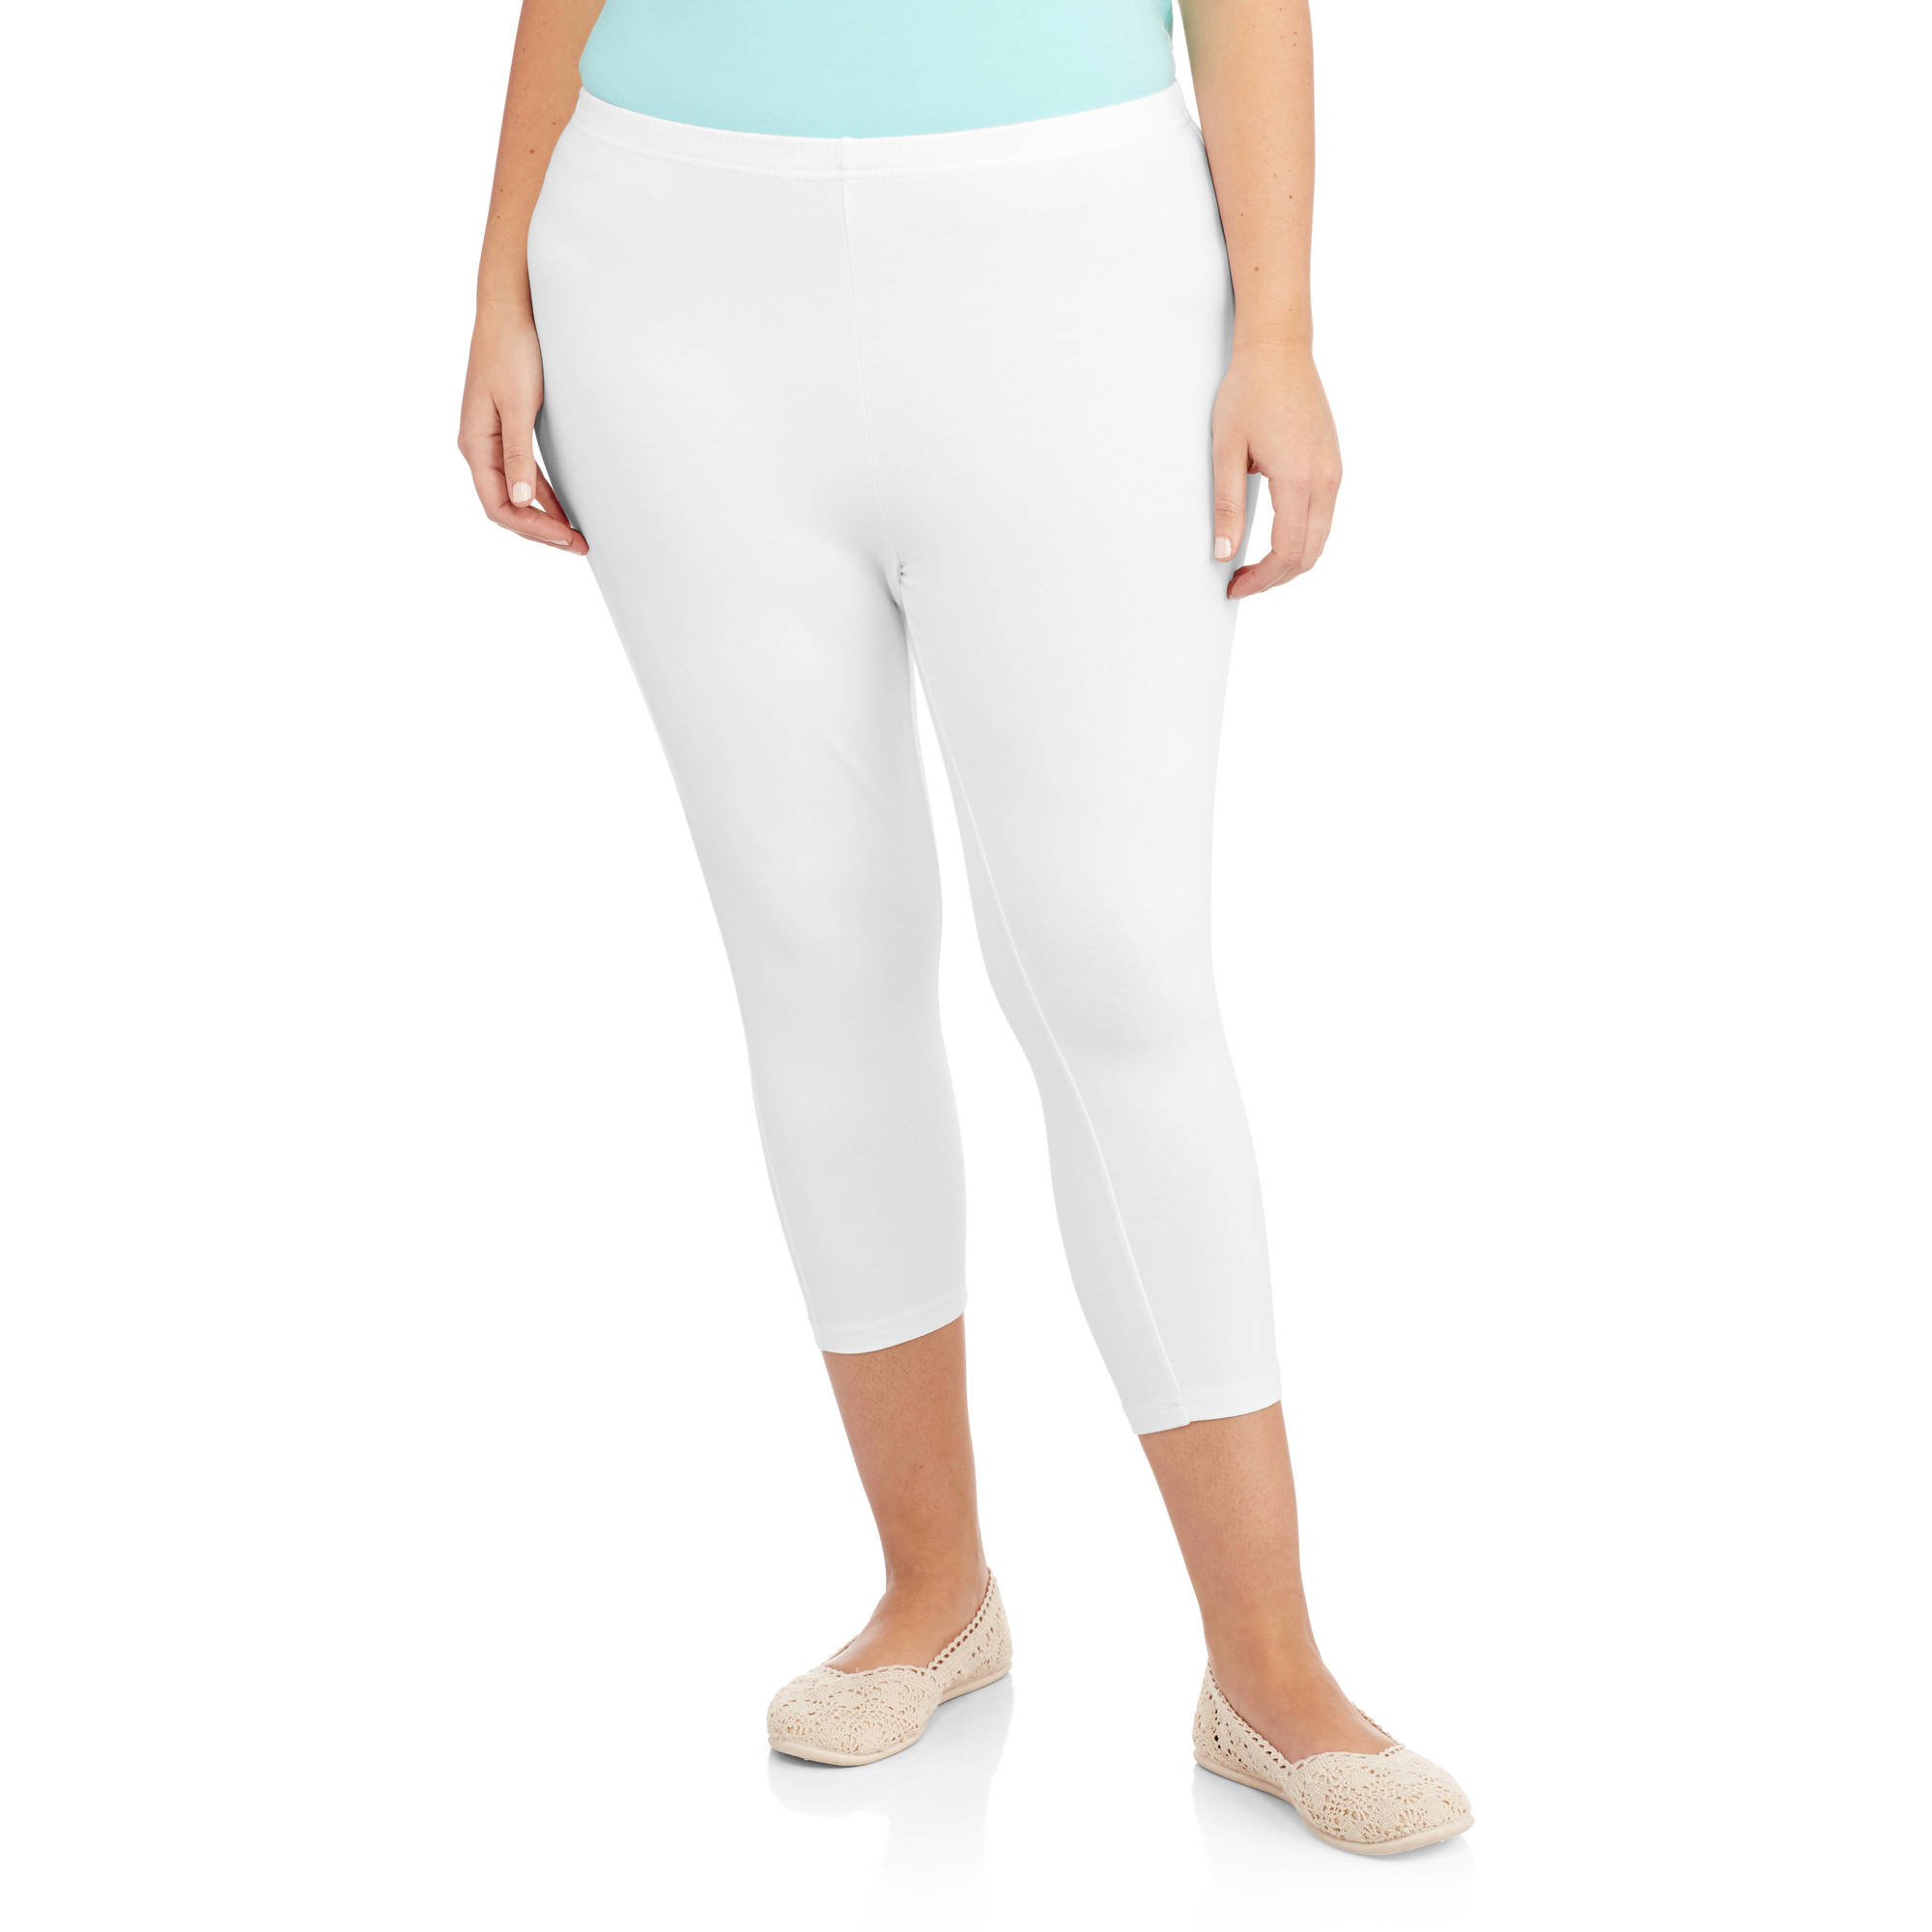 faded glory women's plus-size essential capri leggings - walmart